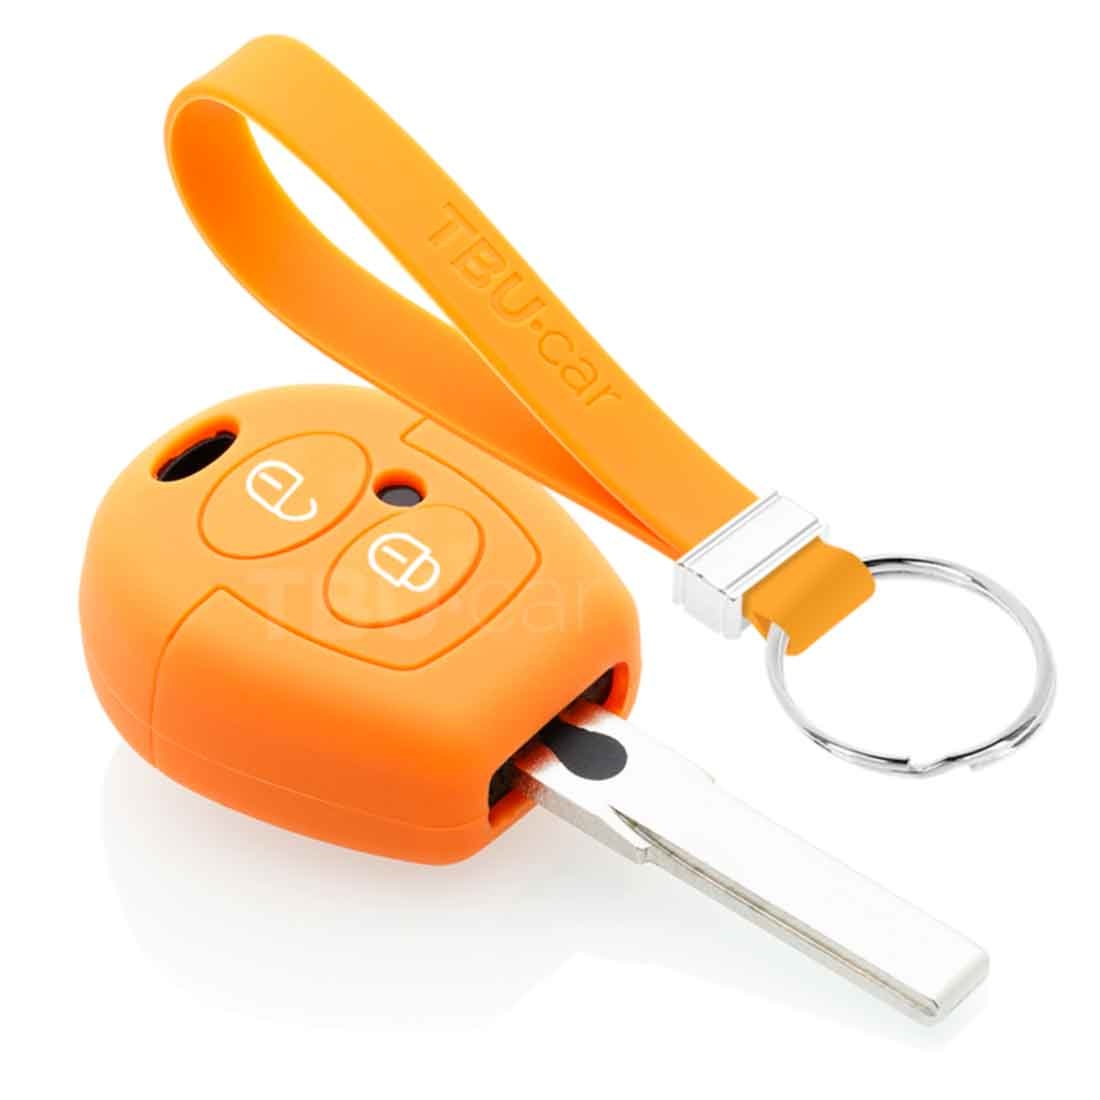 TBU car TBU car Autoschlüssel Hülle kompatibel mit Seat 2 Tasten - Schutzhülle aus Silikon - Auto Schlüsselhülle Cover in Orange